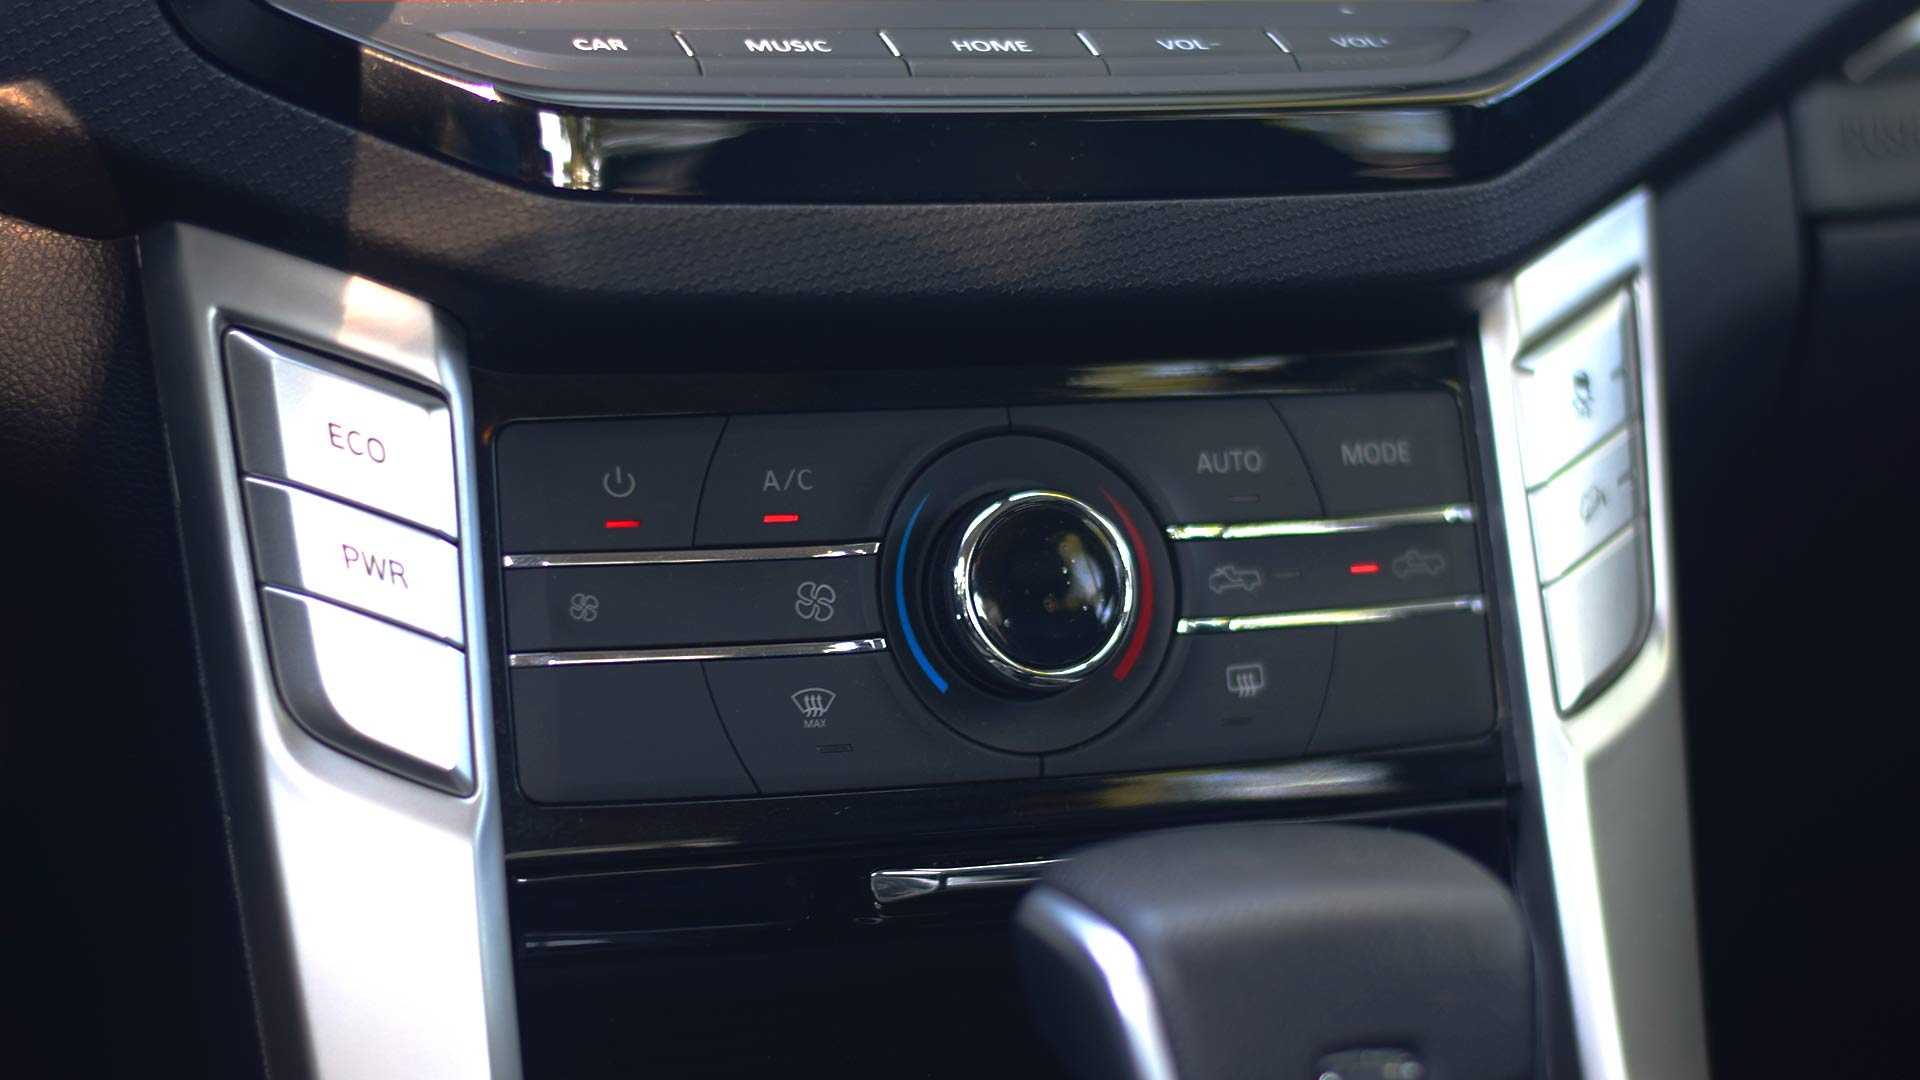 The Maxus T60 steering wheel controls